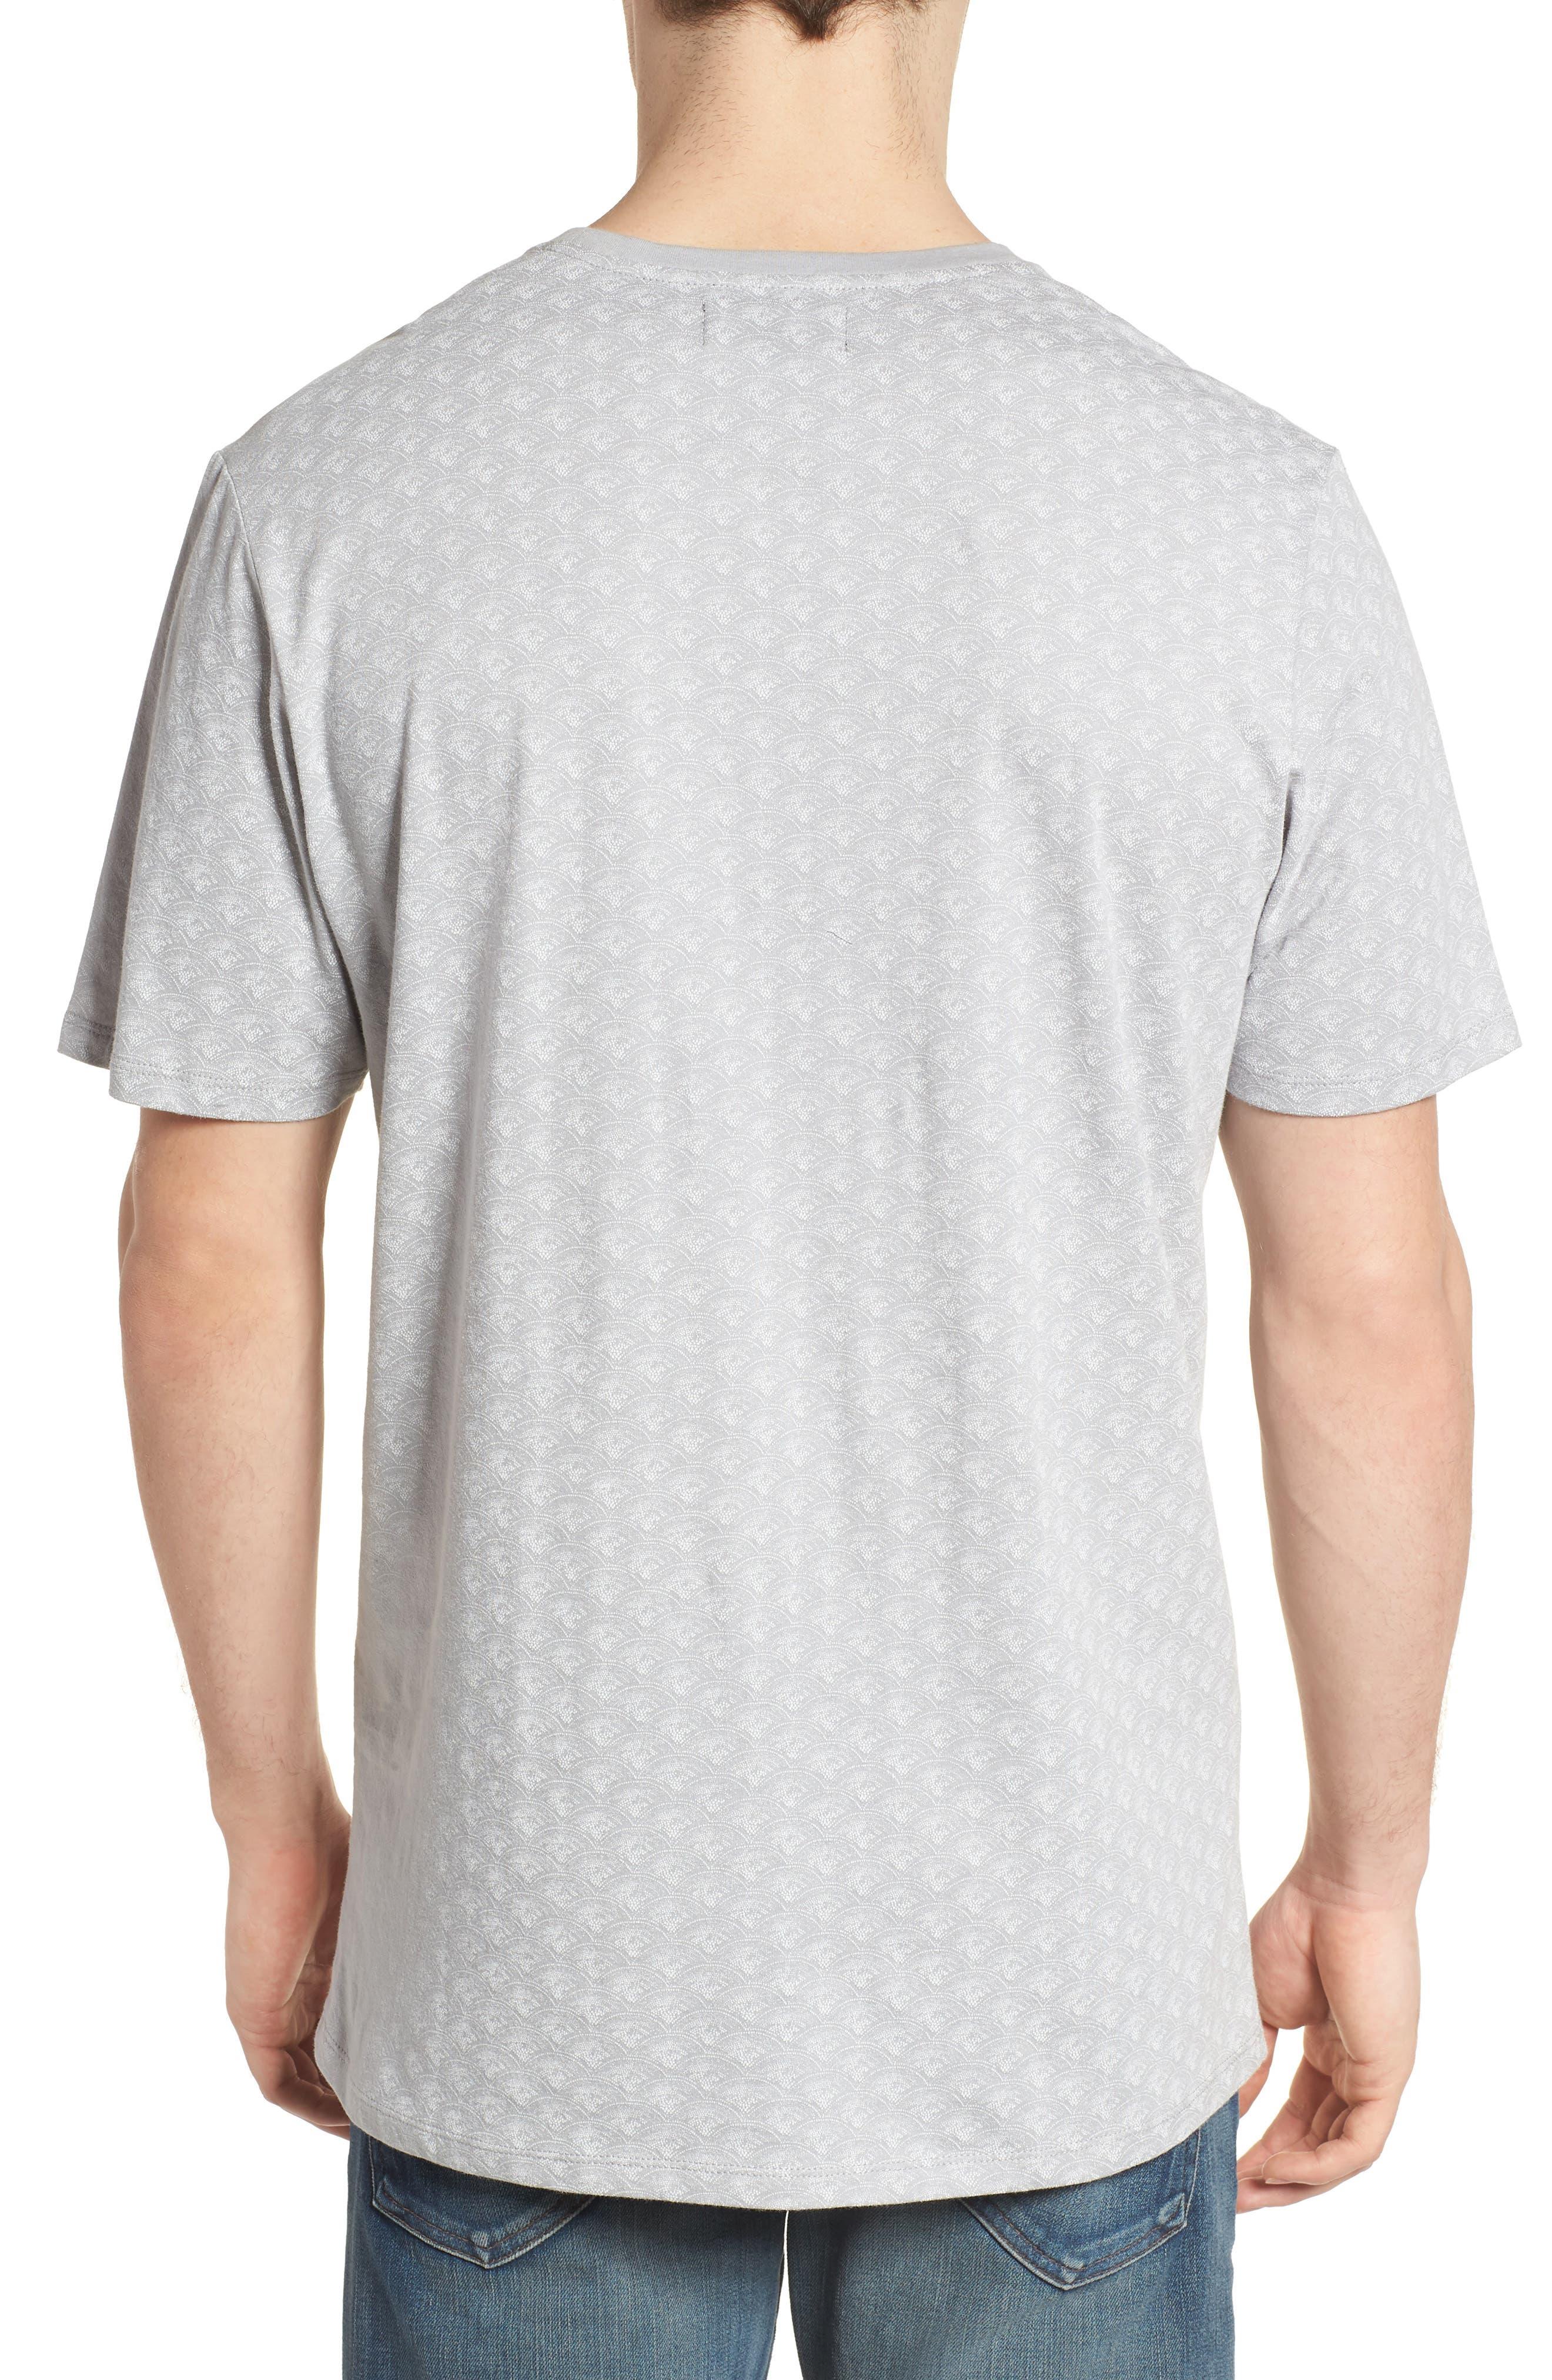 Pescado Short Sleeve T-Shirt,                             Alternate thumbnail 2, color,                             133